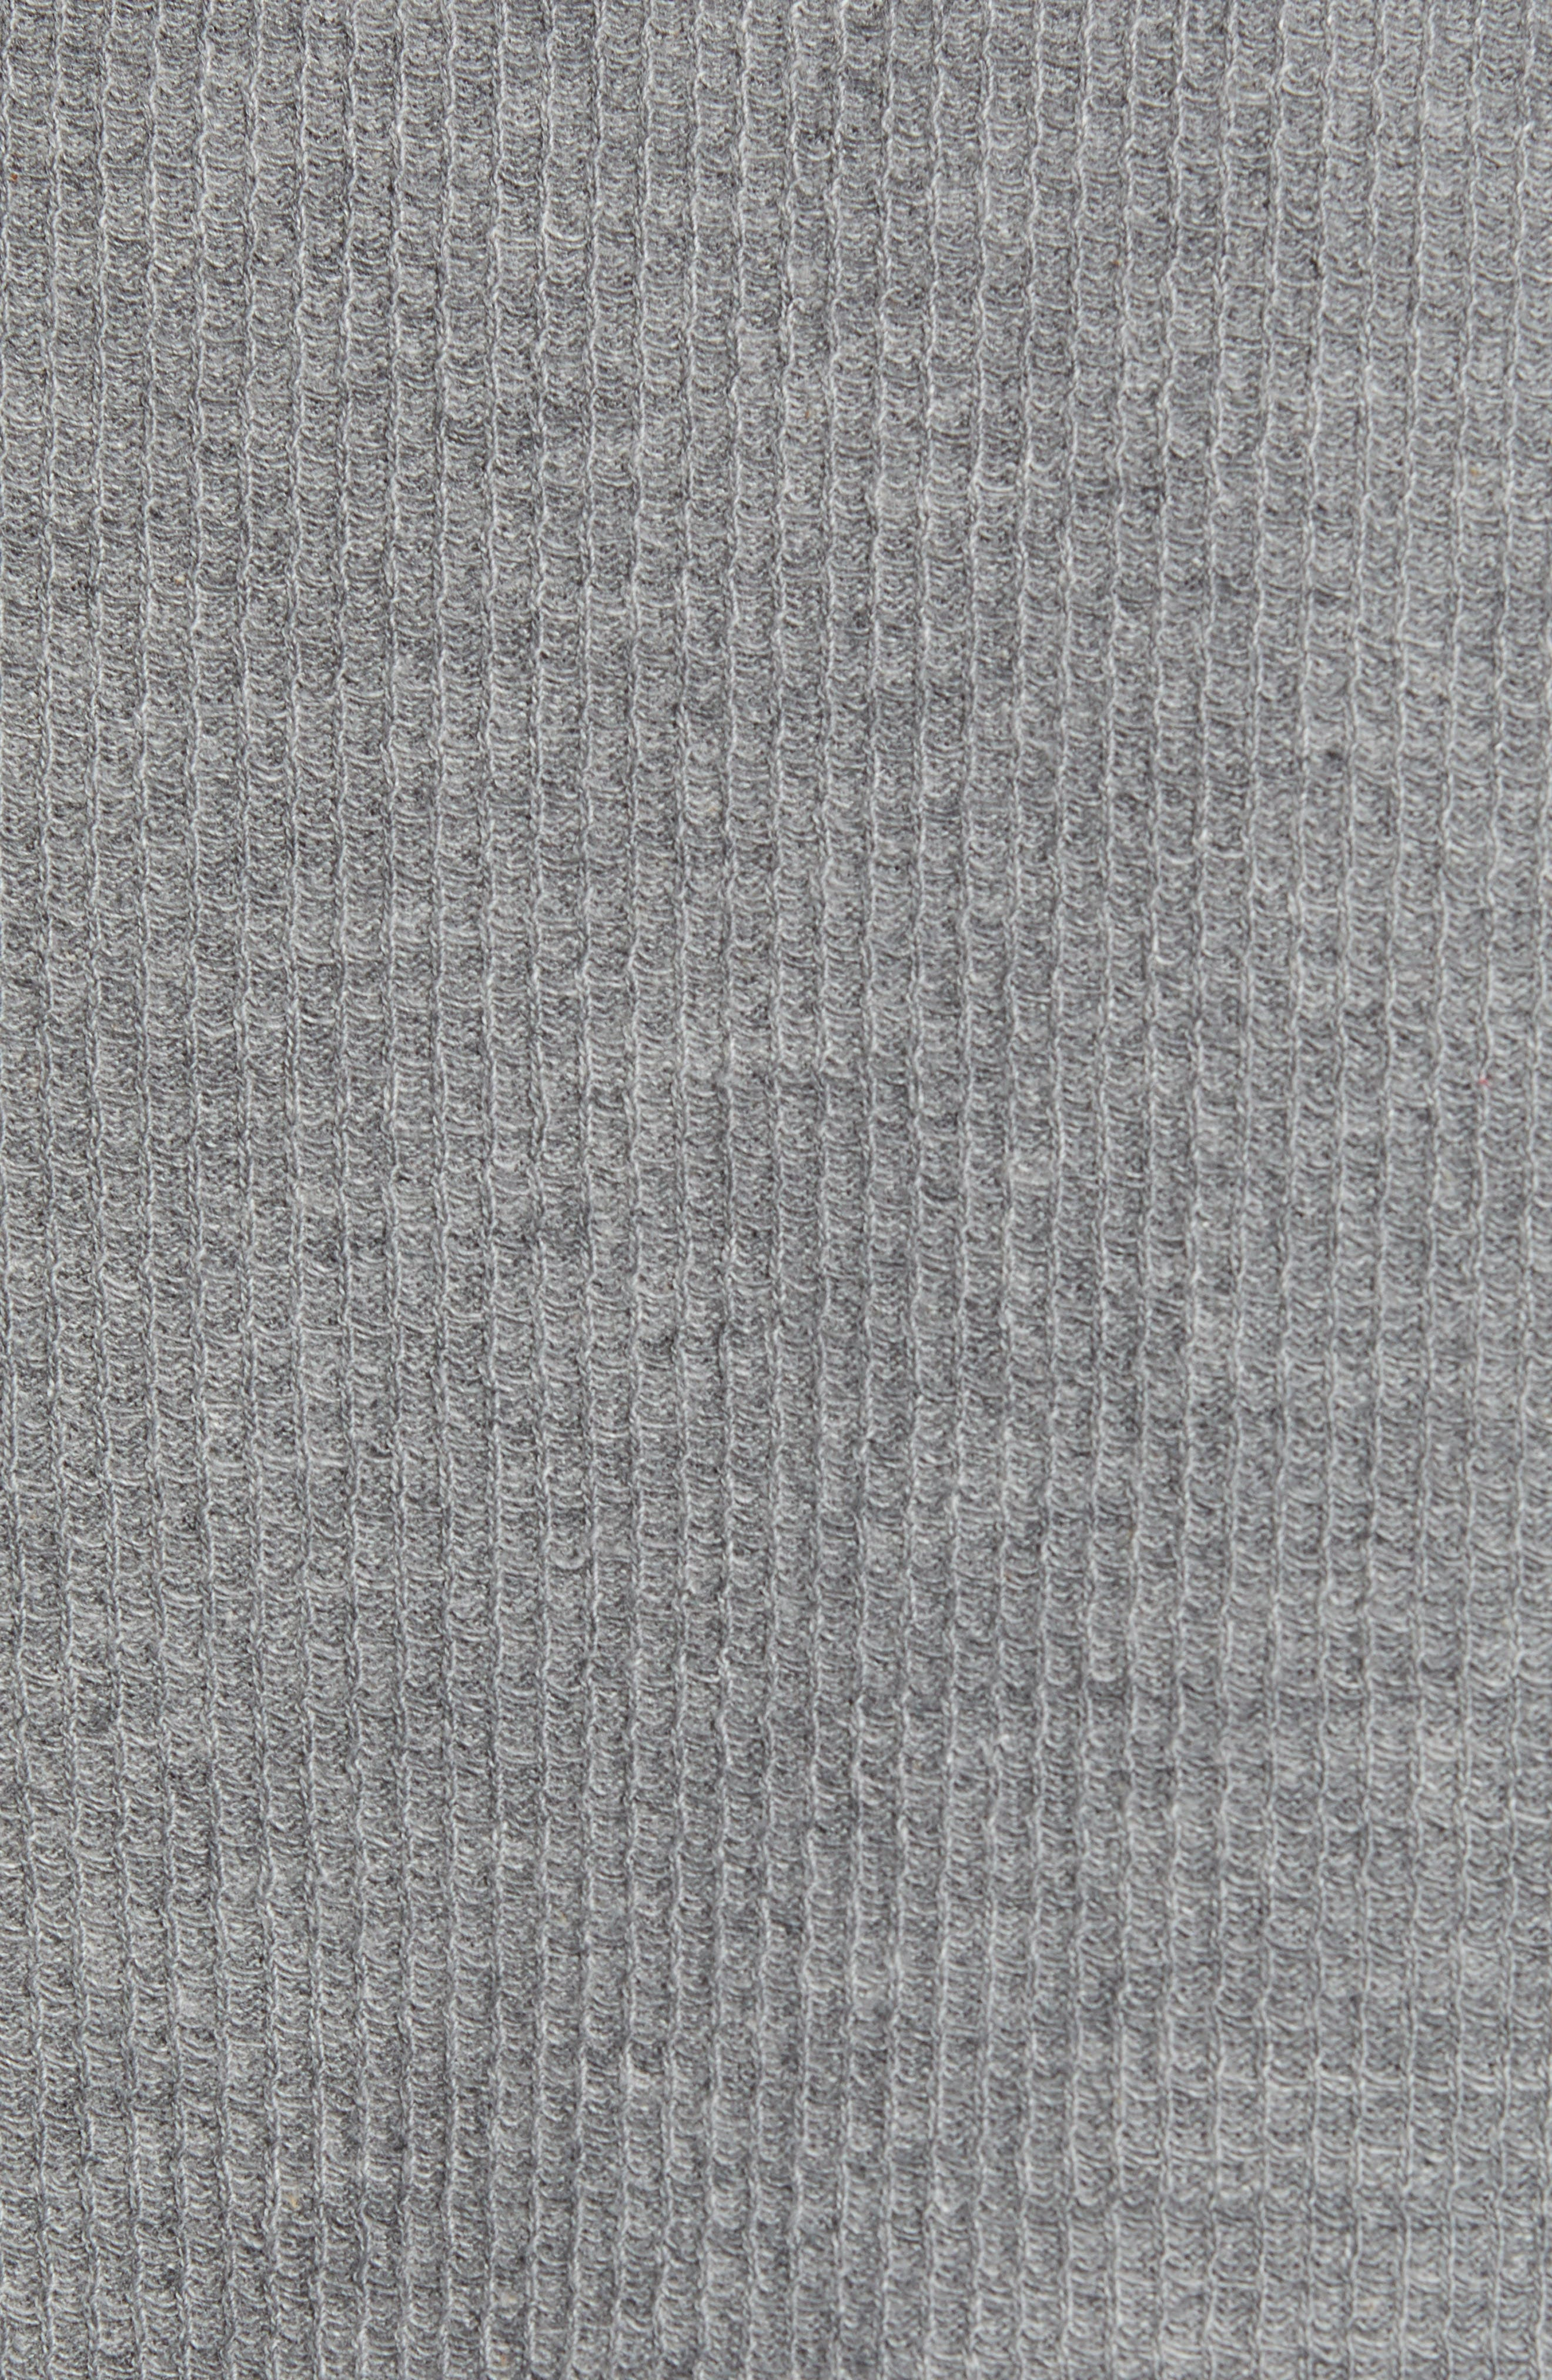 Textor Quarter Zip Thermal T-Shirt,                             Alternate thumbnail 5, color,                             GREY